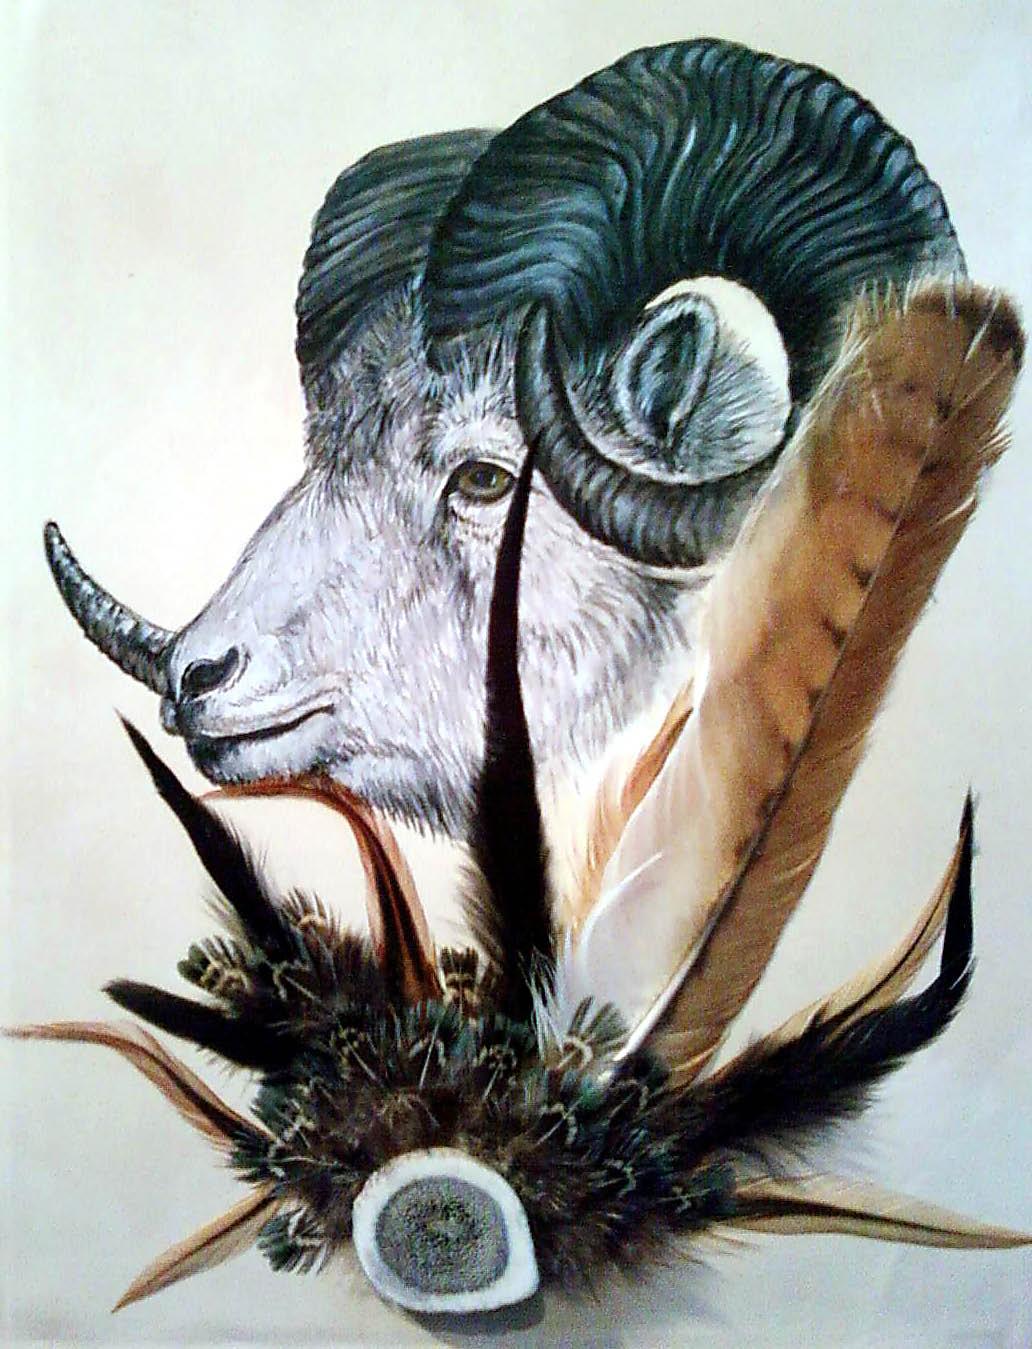 Acrylic/Feathers - Ram